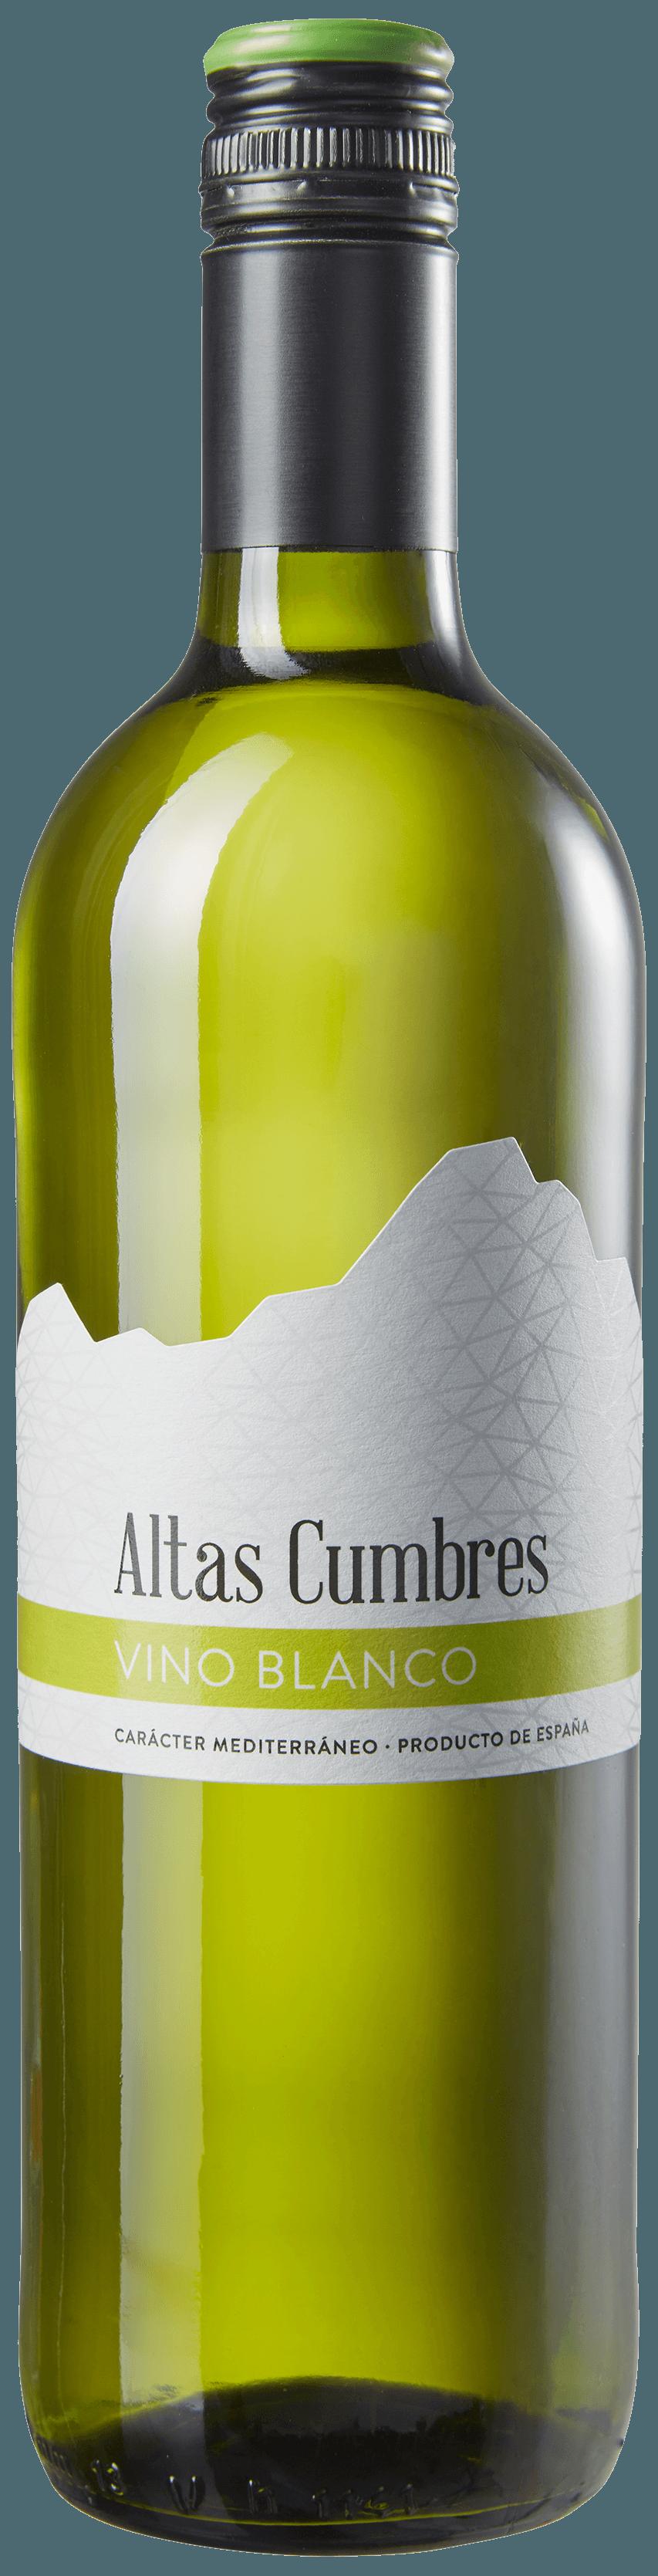 Image 0: Altas Cumbres Blanco